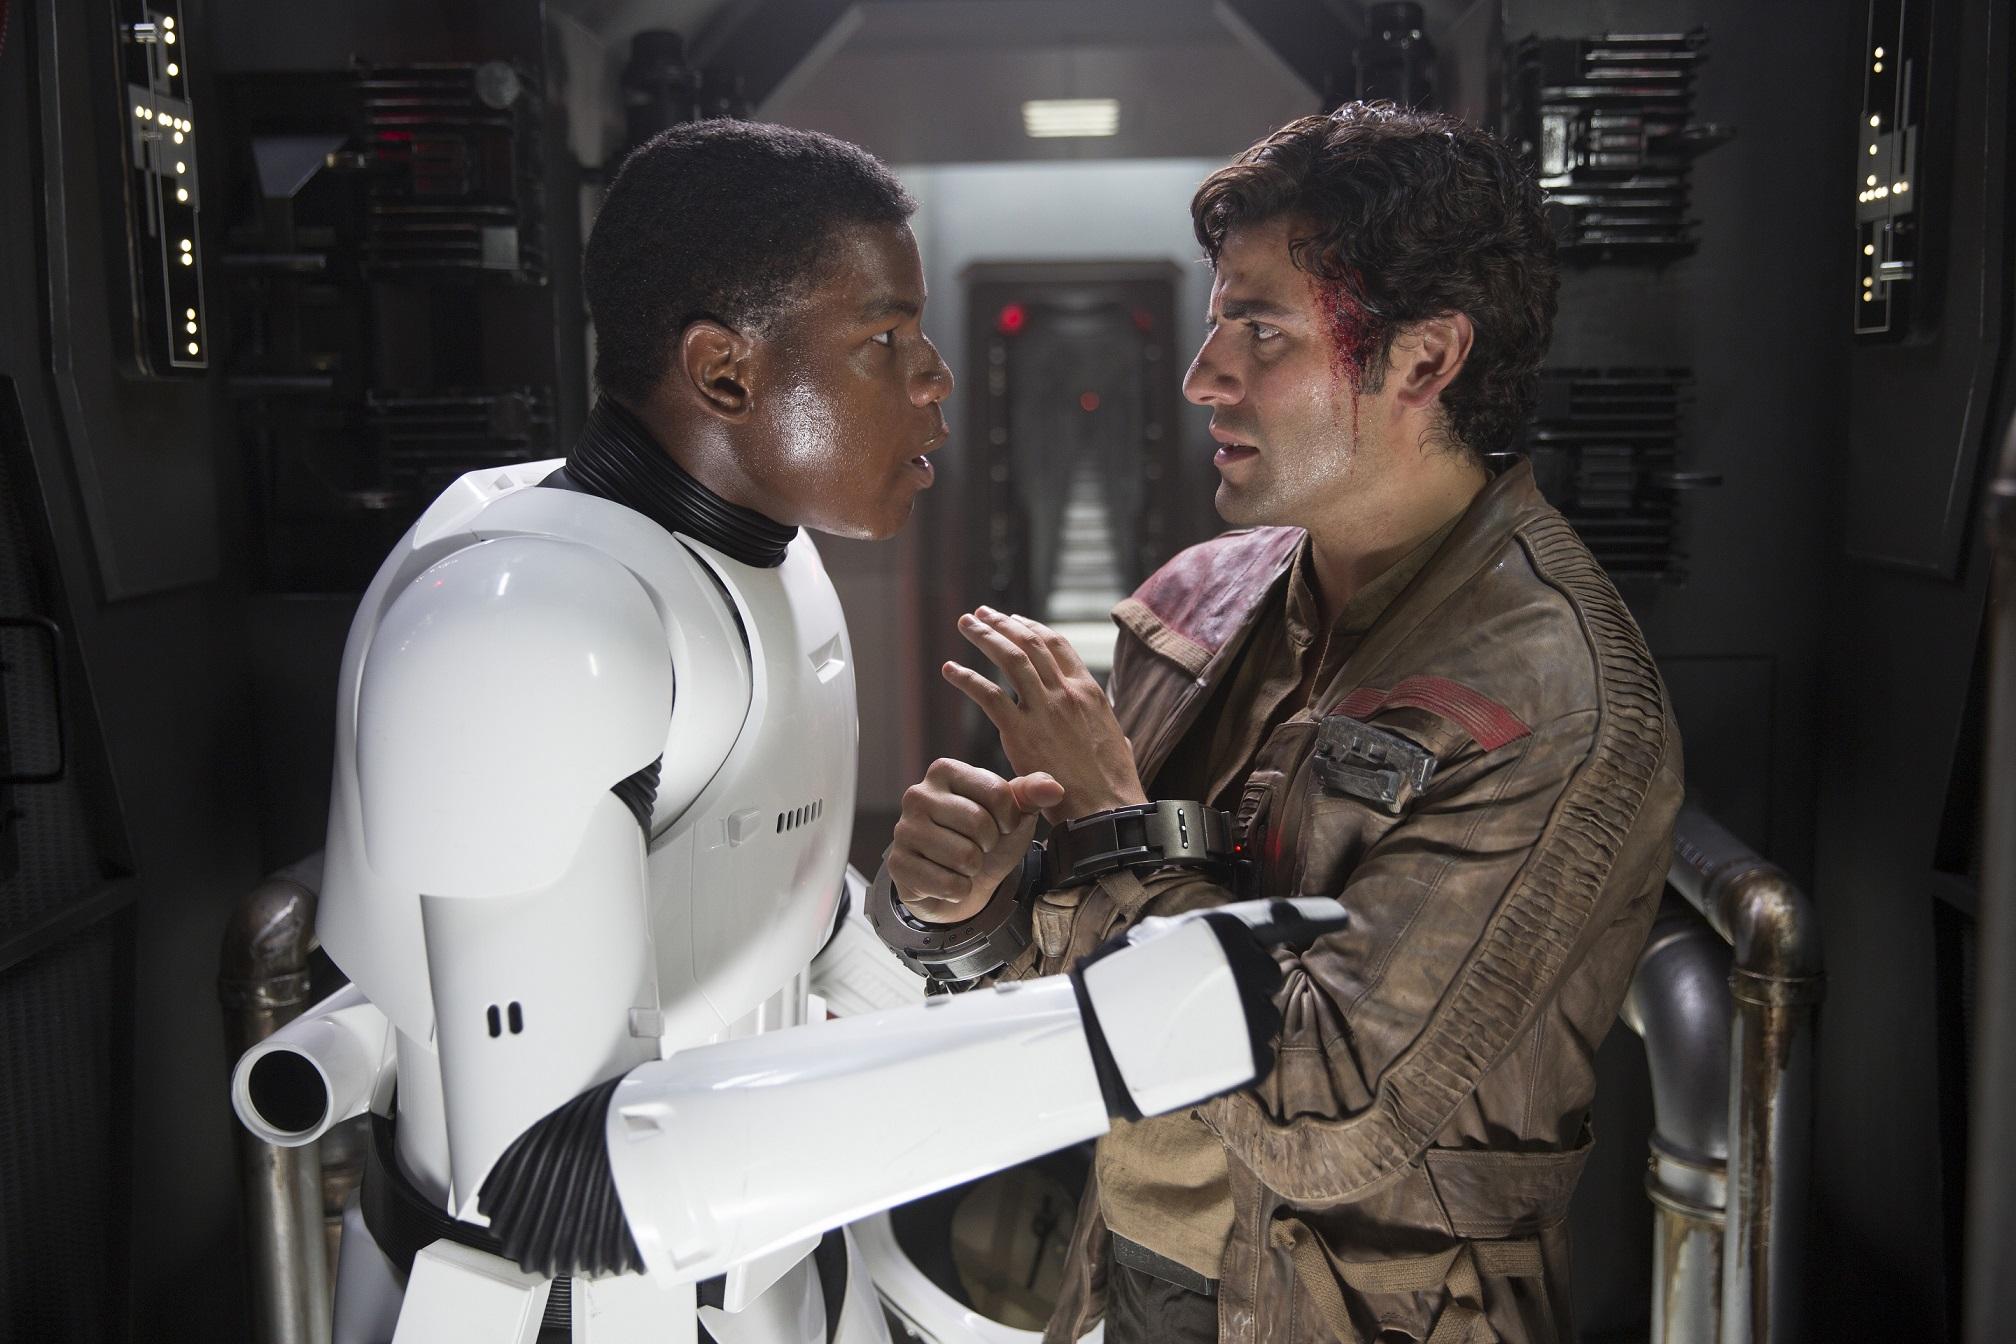 Star Wars: The Force Awakens..L to R: Finn (John Boyega) and Poe Dameron (Oscar Isaac)..Ph: David James..? 2015 Lucasfilm Ltd. & TM. All Right Reserved.